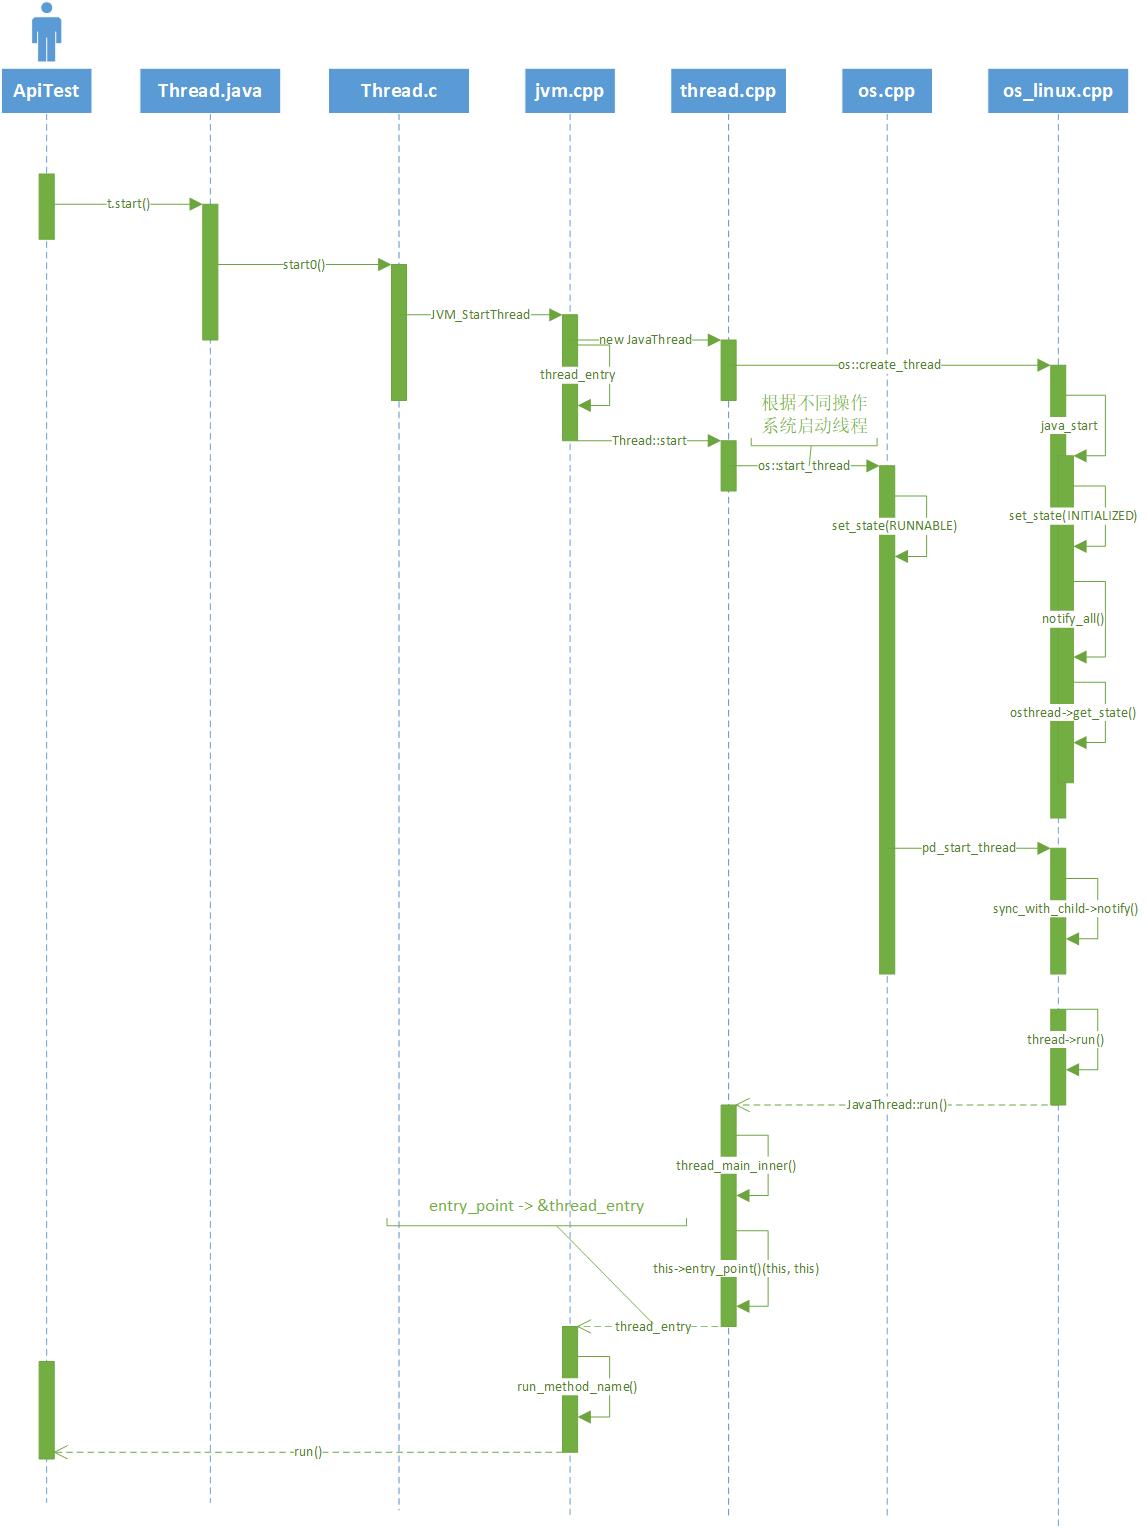 图 19-2 Thread start UML 图